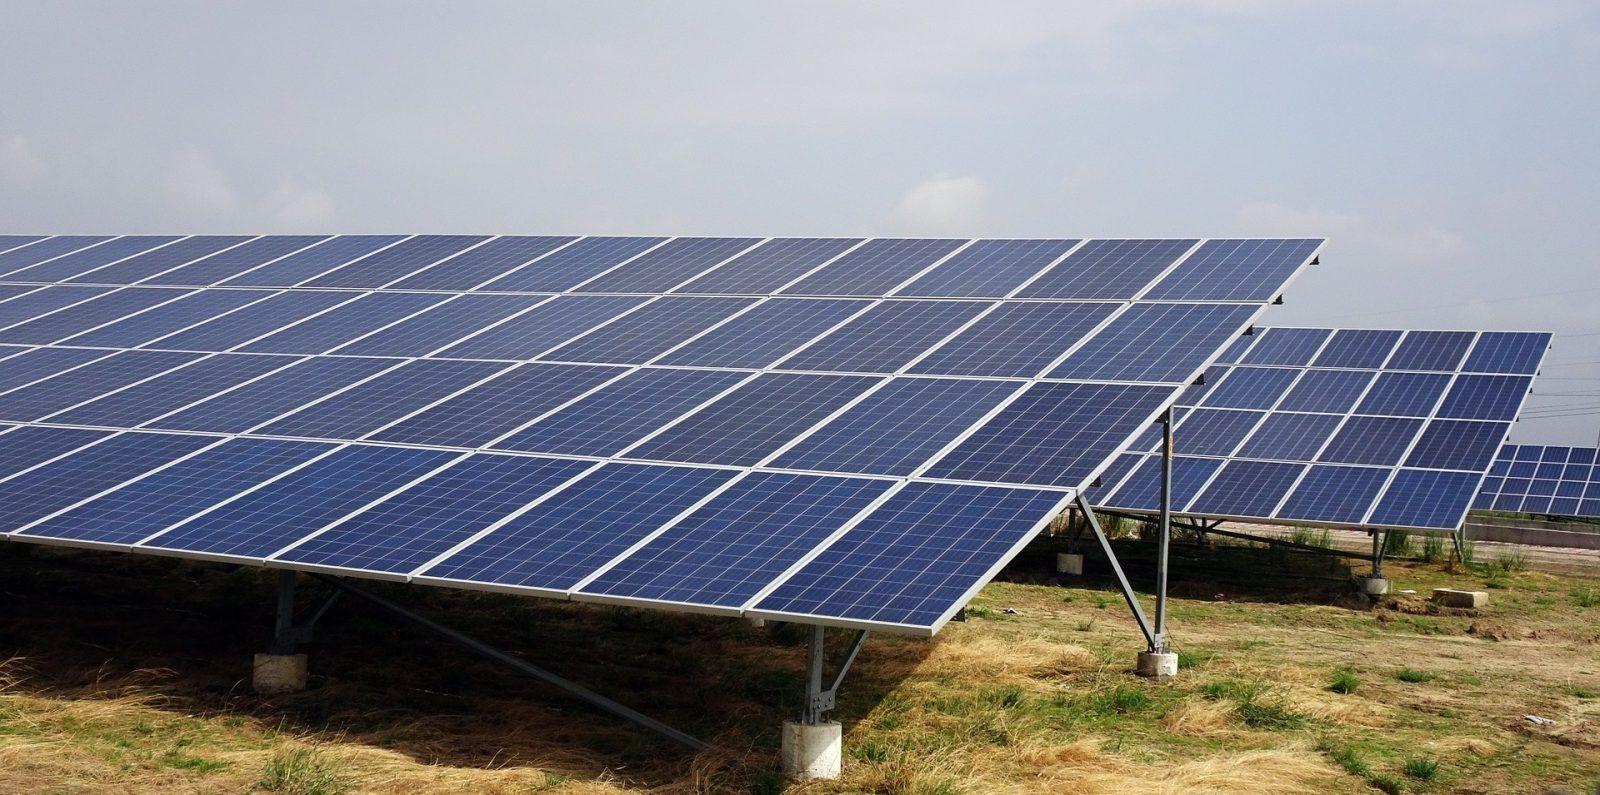 Egeb Another Solar Advance Ny Solar Boost Ireland S Renewable Energy Shortfall And More Solar Farm Solar Energy Facts Solar